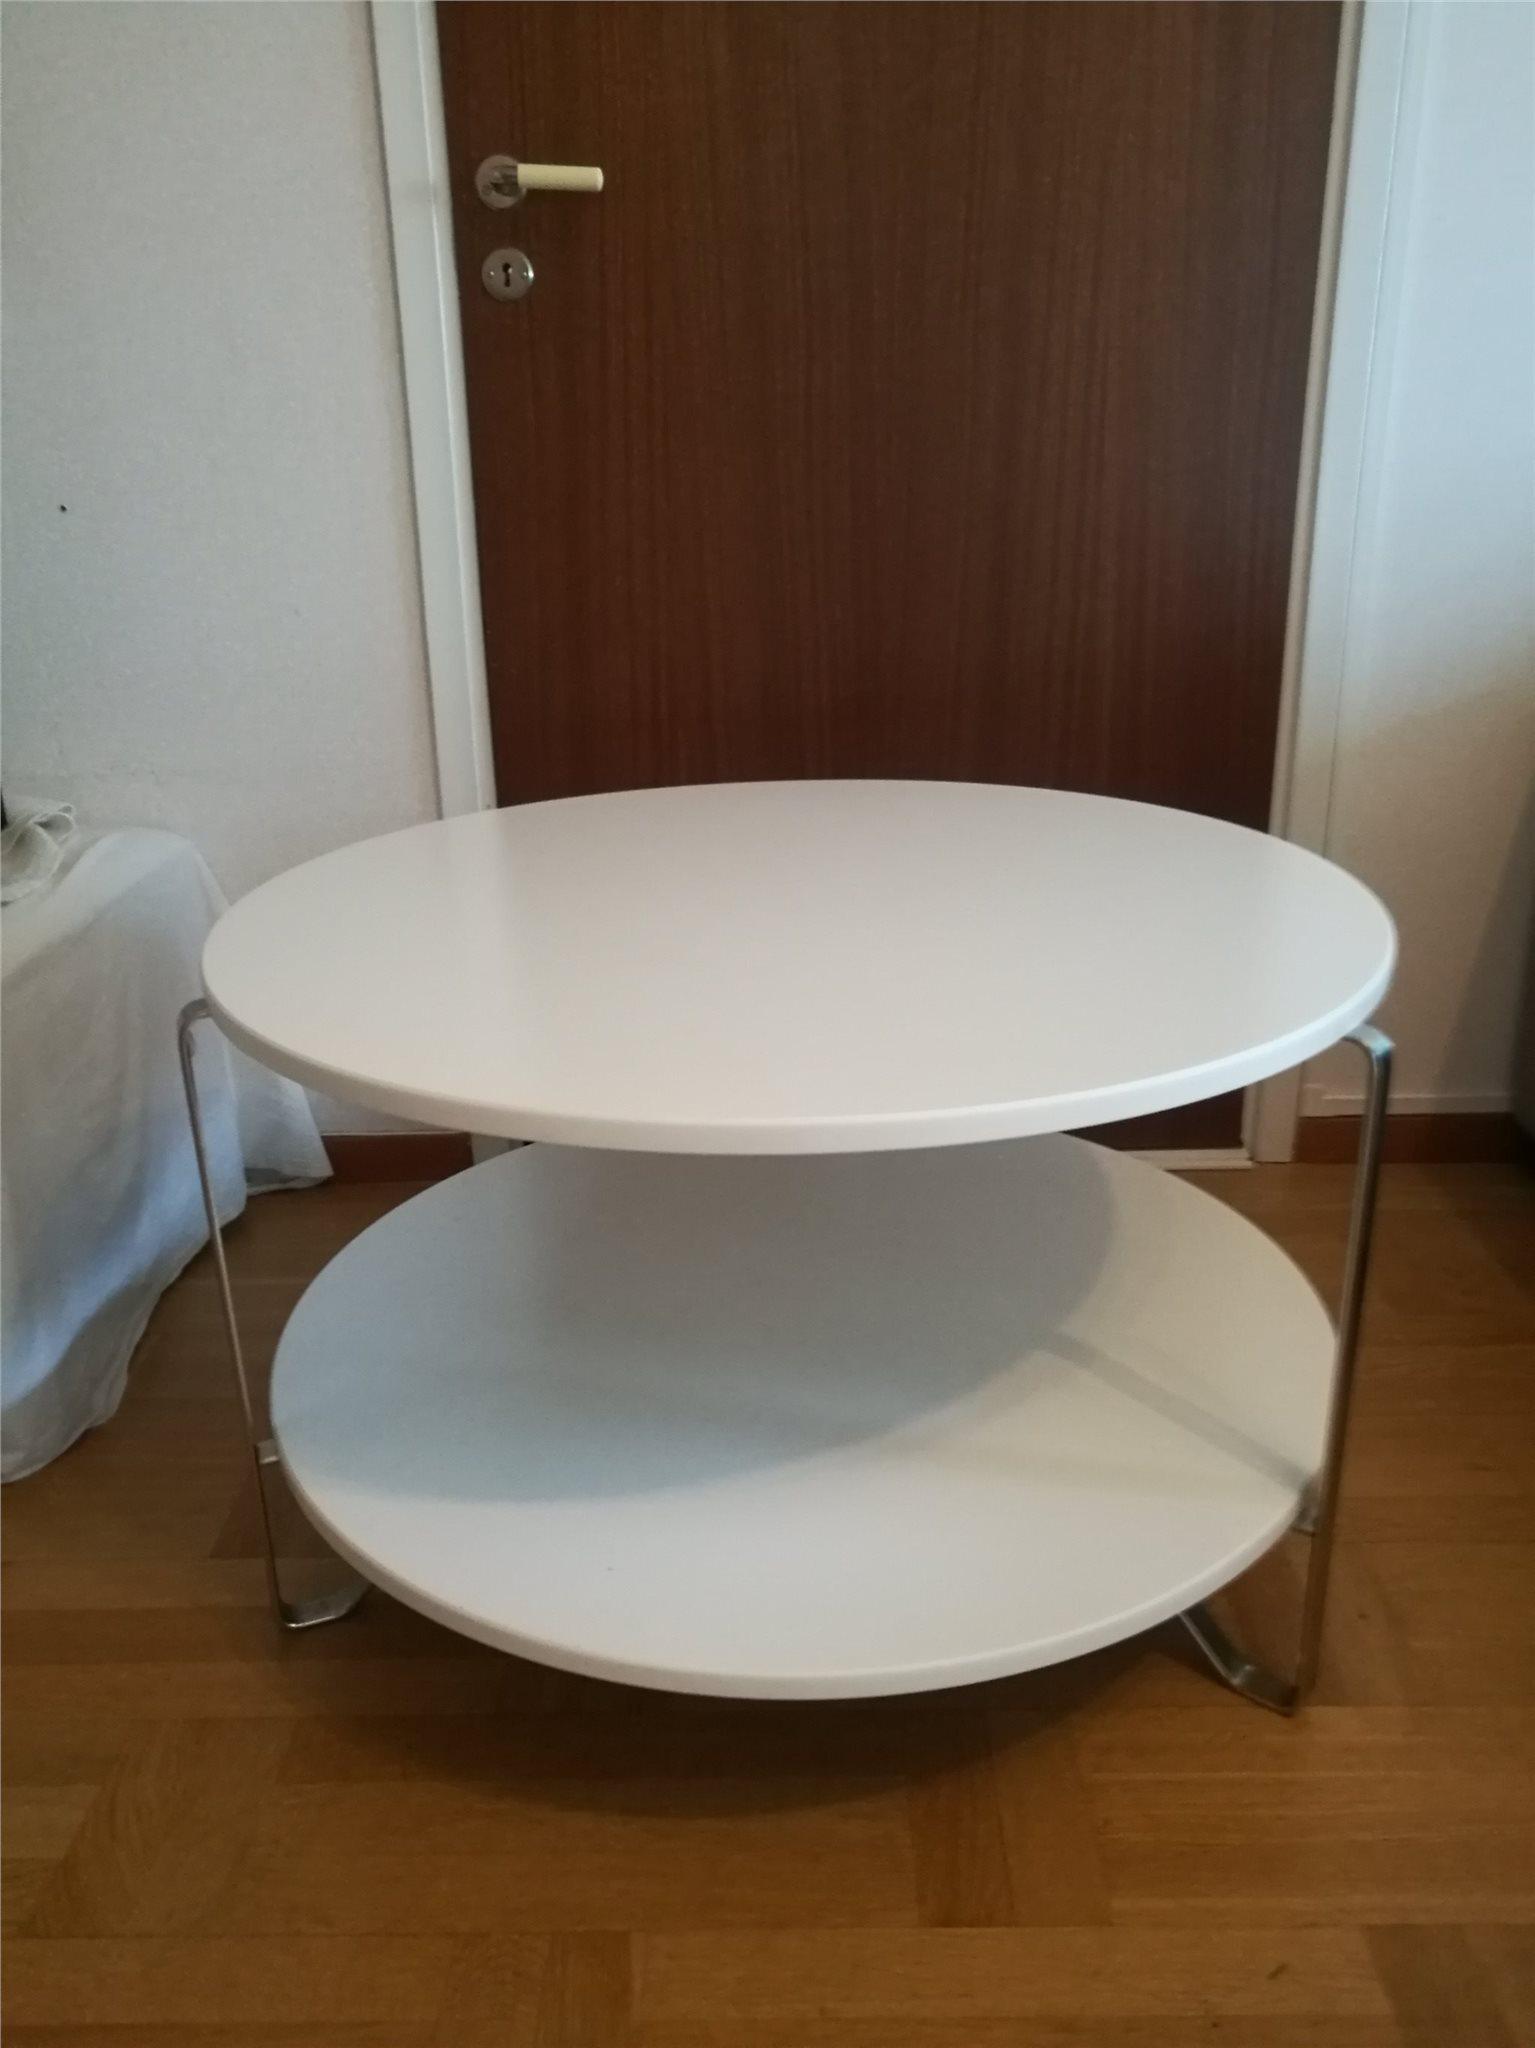 imfors ikea bord soffbord (319770842) ᐈ köp på tradera